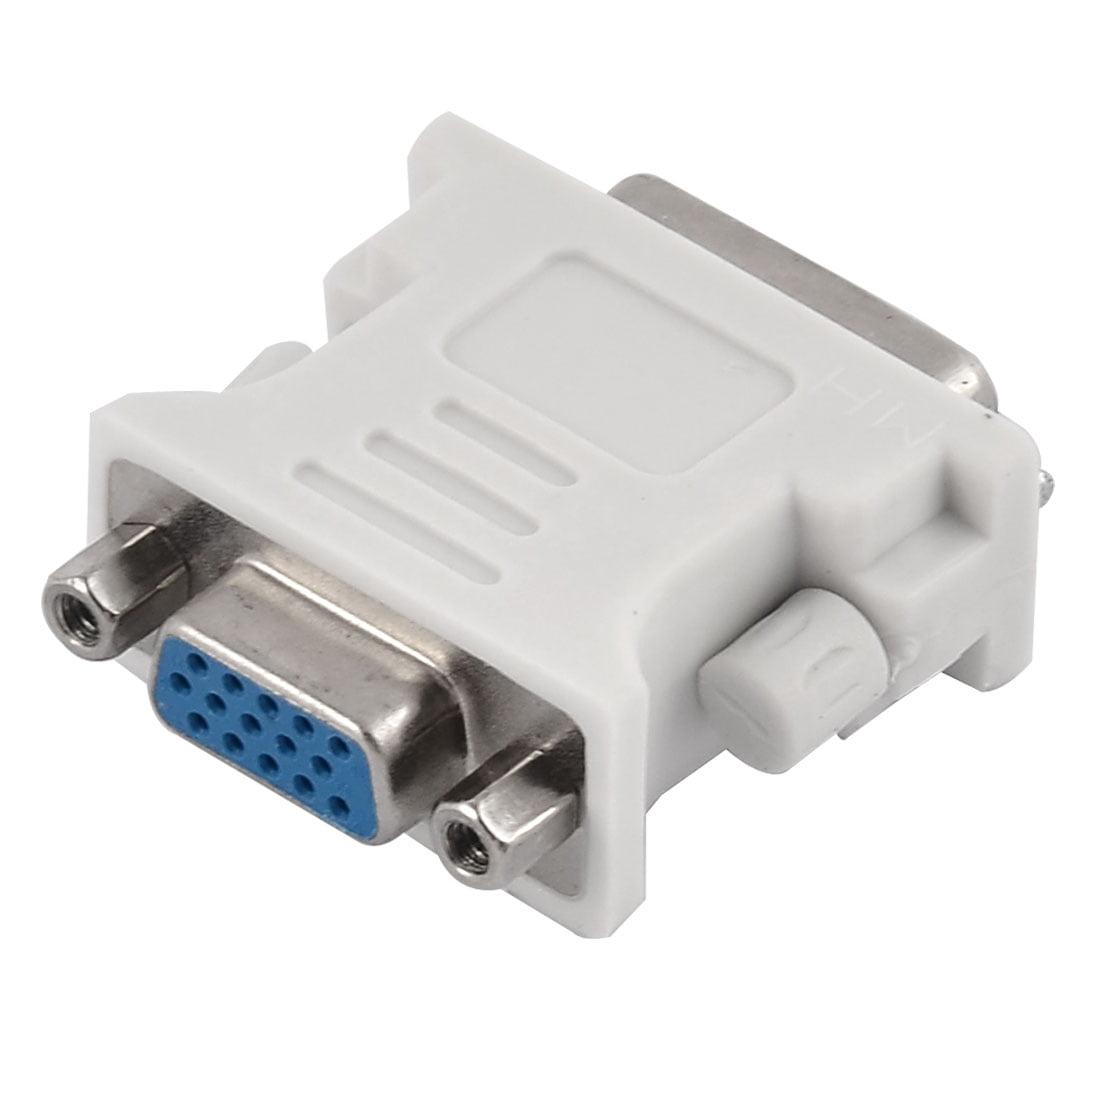 Dvi I 24 5 Pin Male To Vga 15 Female Converter Convertor Adapter Konventer White